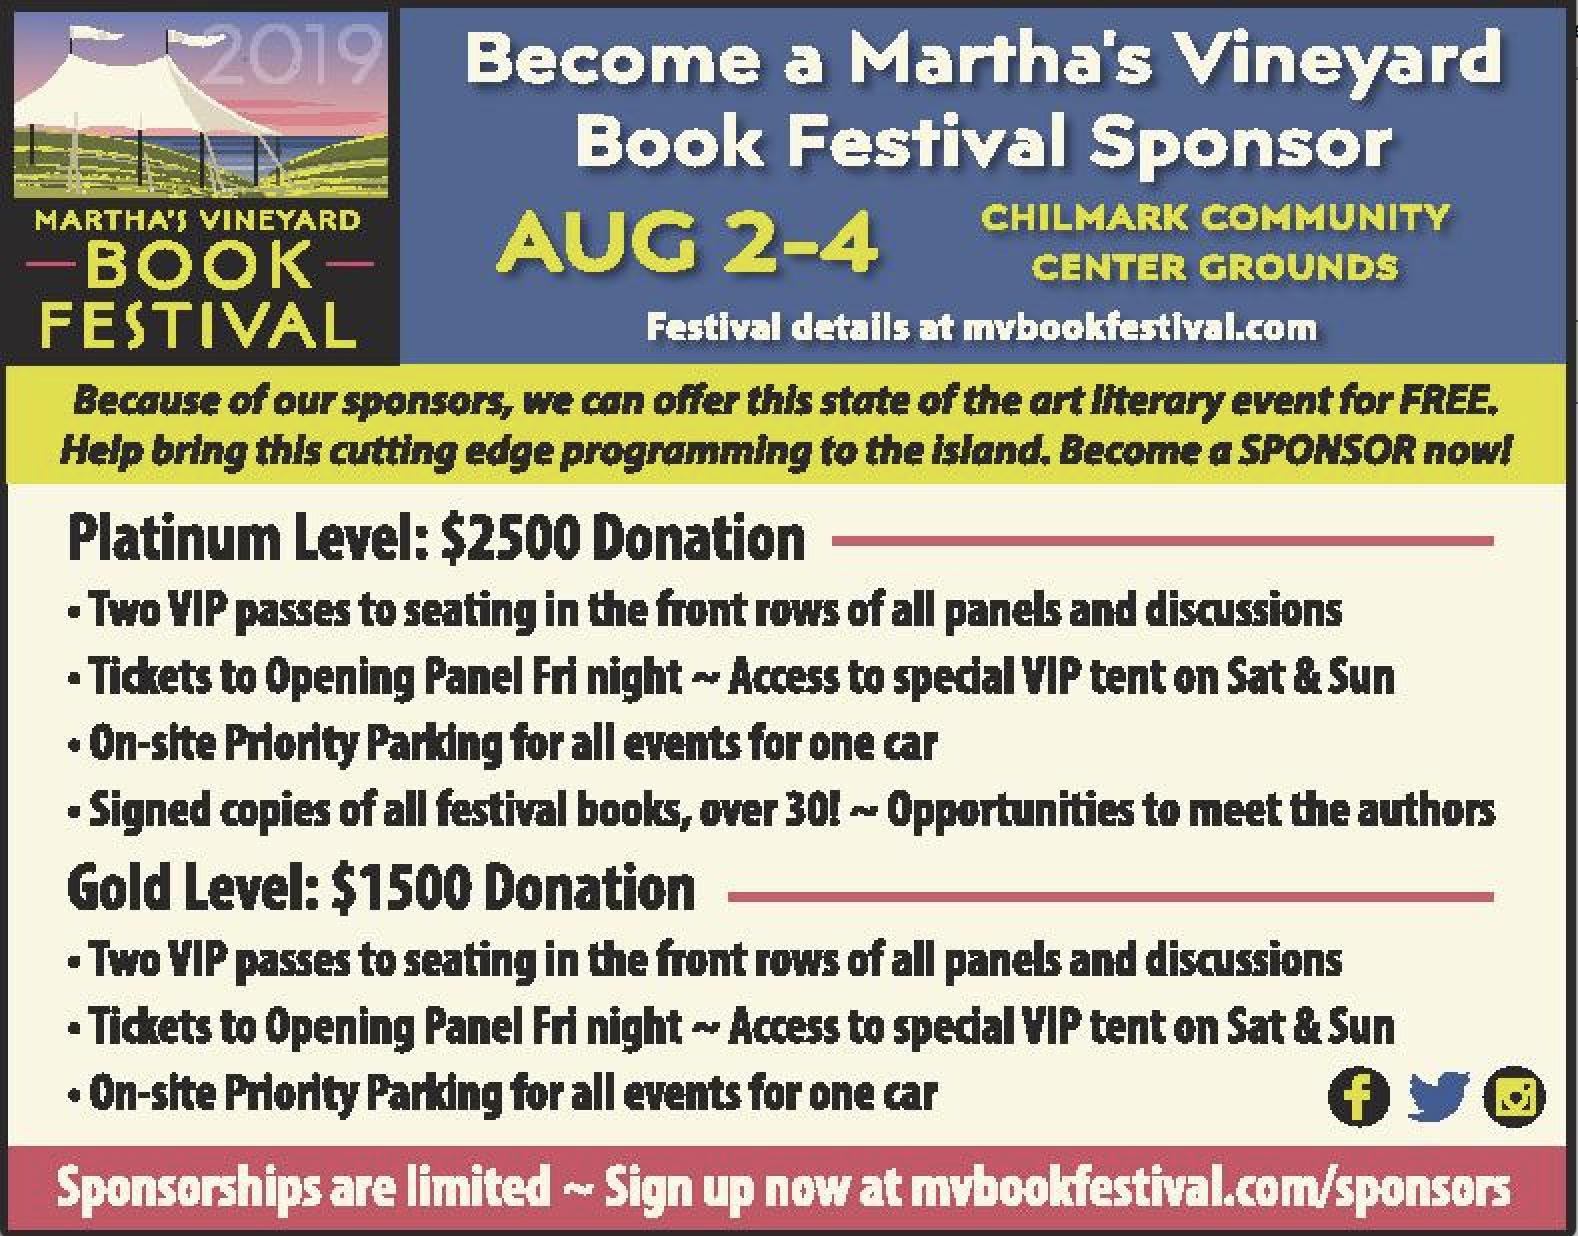 Book Festival Sponsor 2019.png